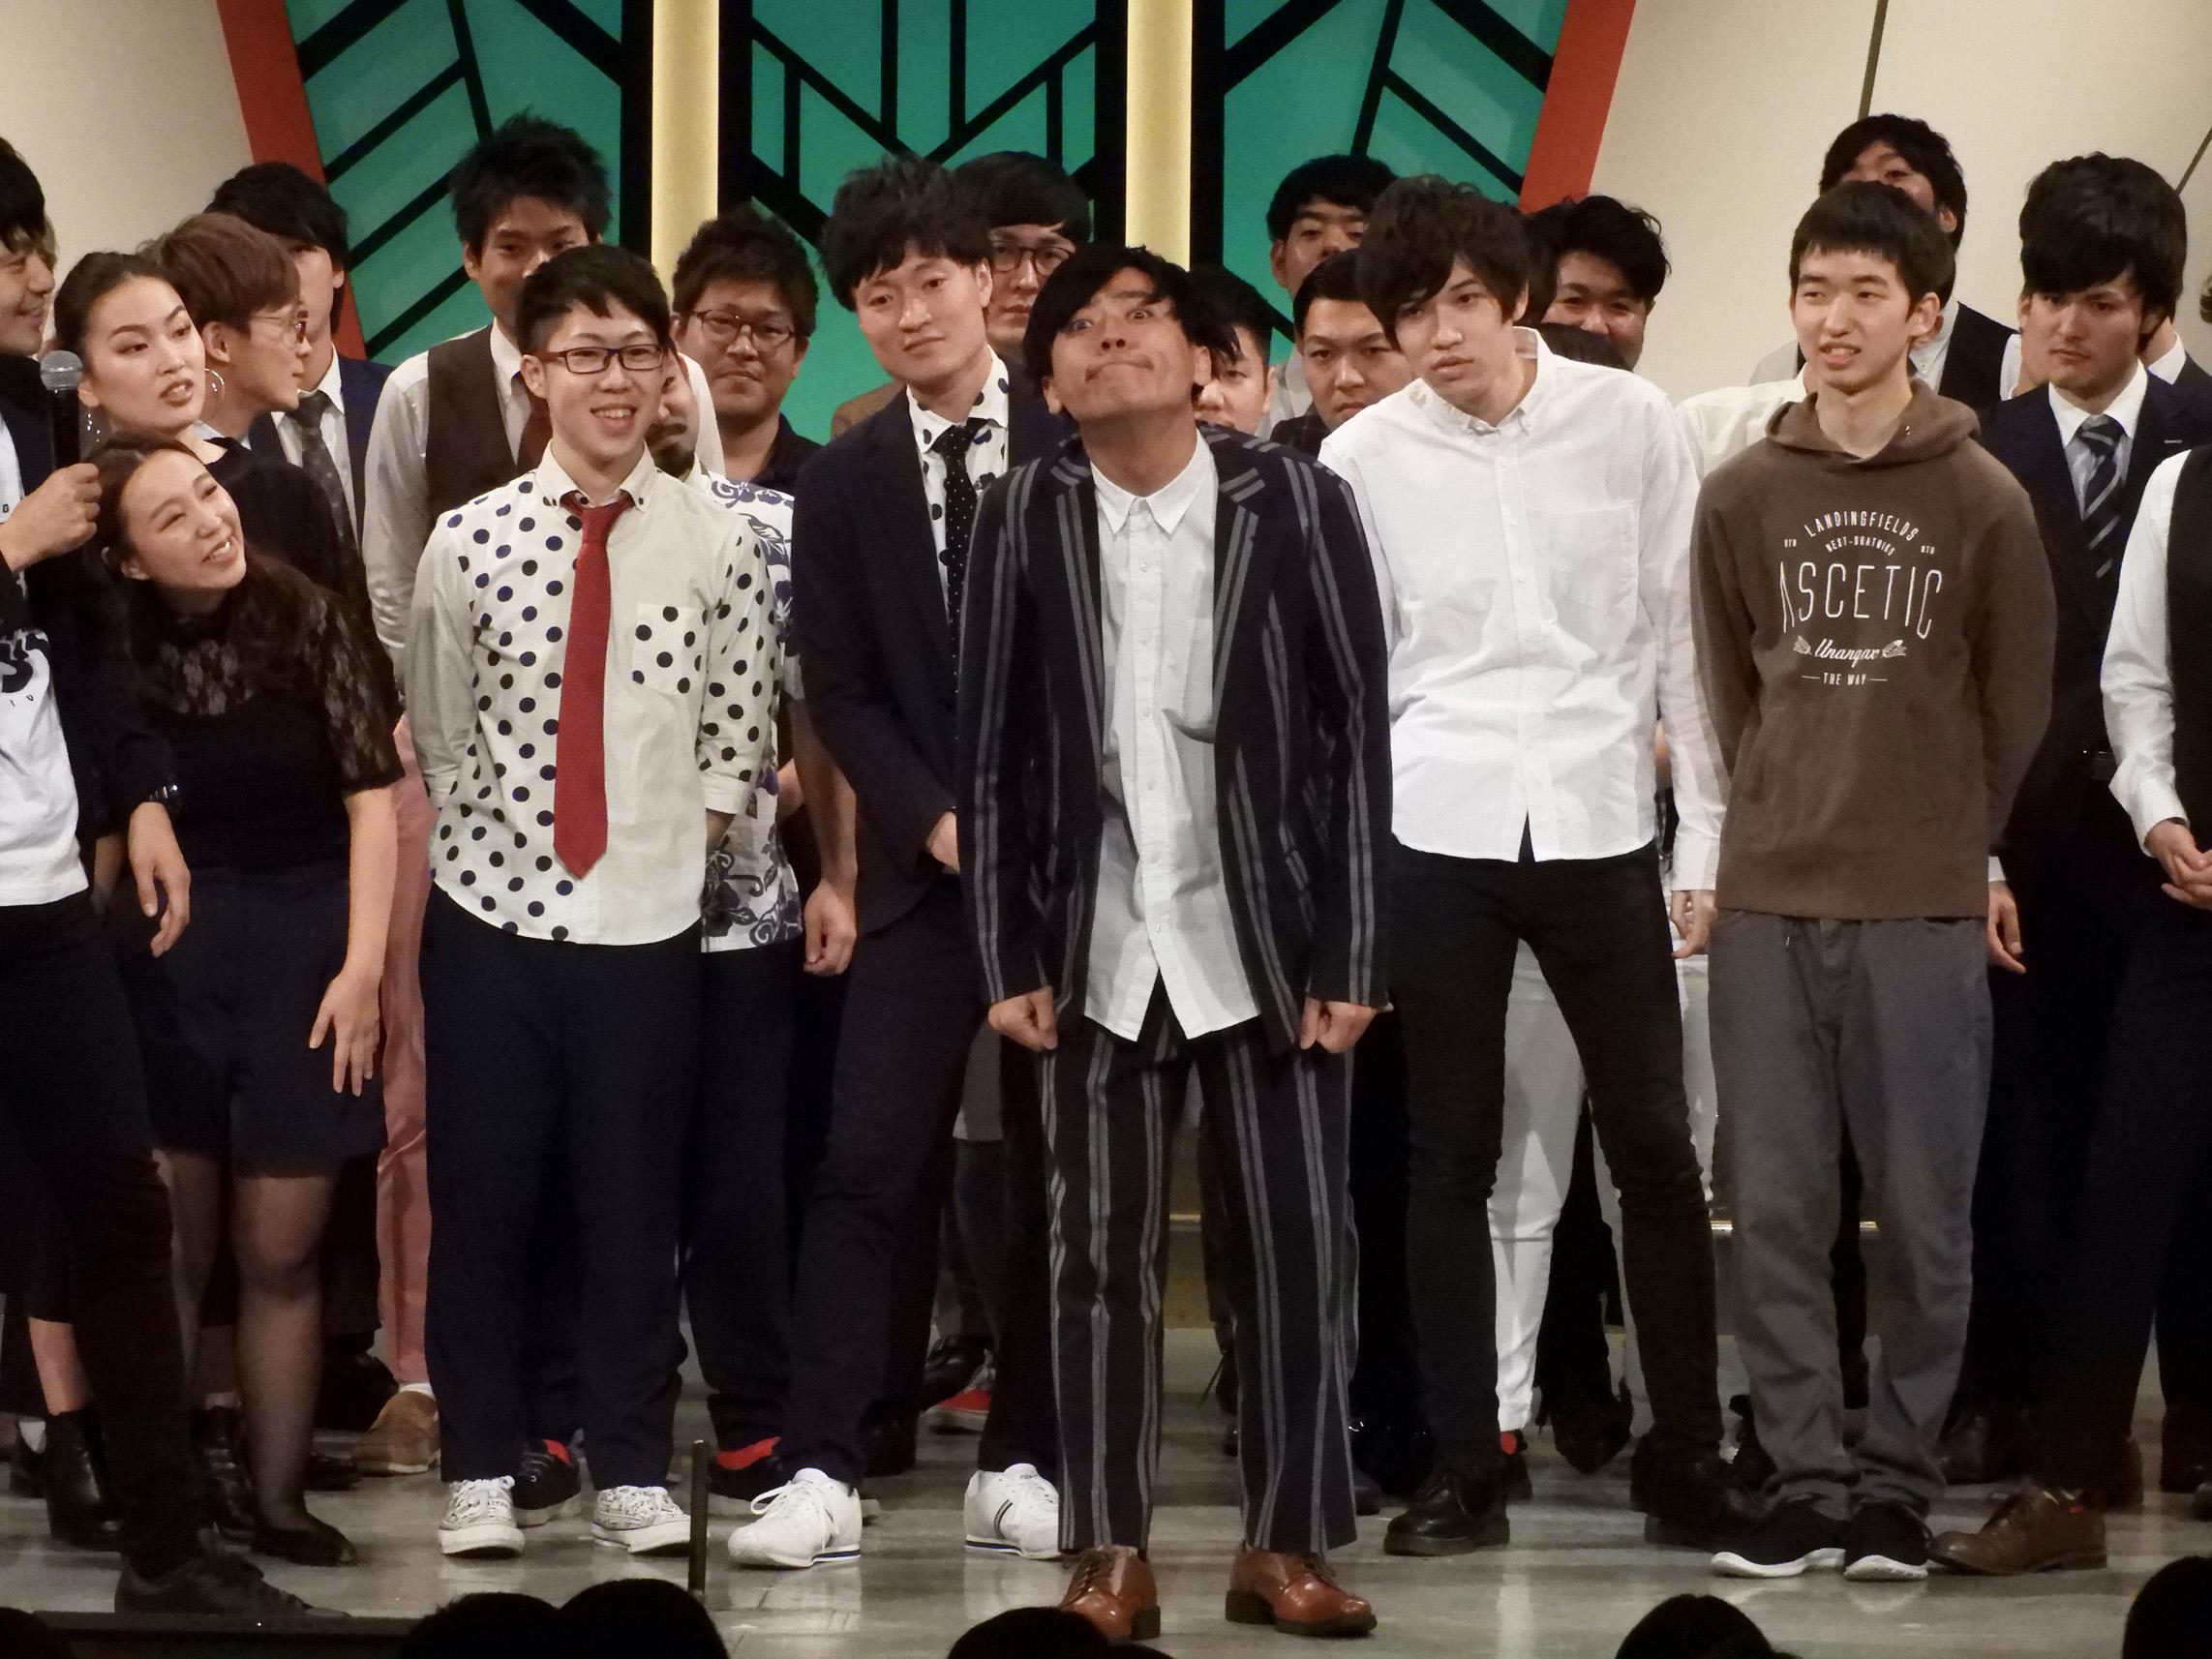 http://news.yoshimoto.co.jp/20181109120950-4f56848ee7268d9fed79d1f1e1b21ead3af68b65.jpg